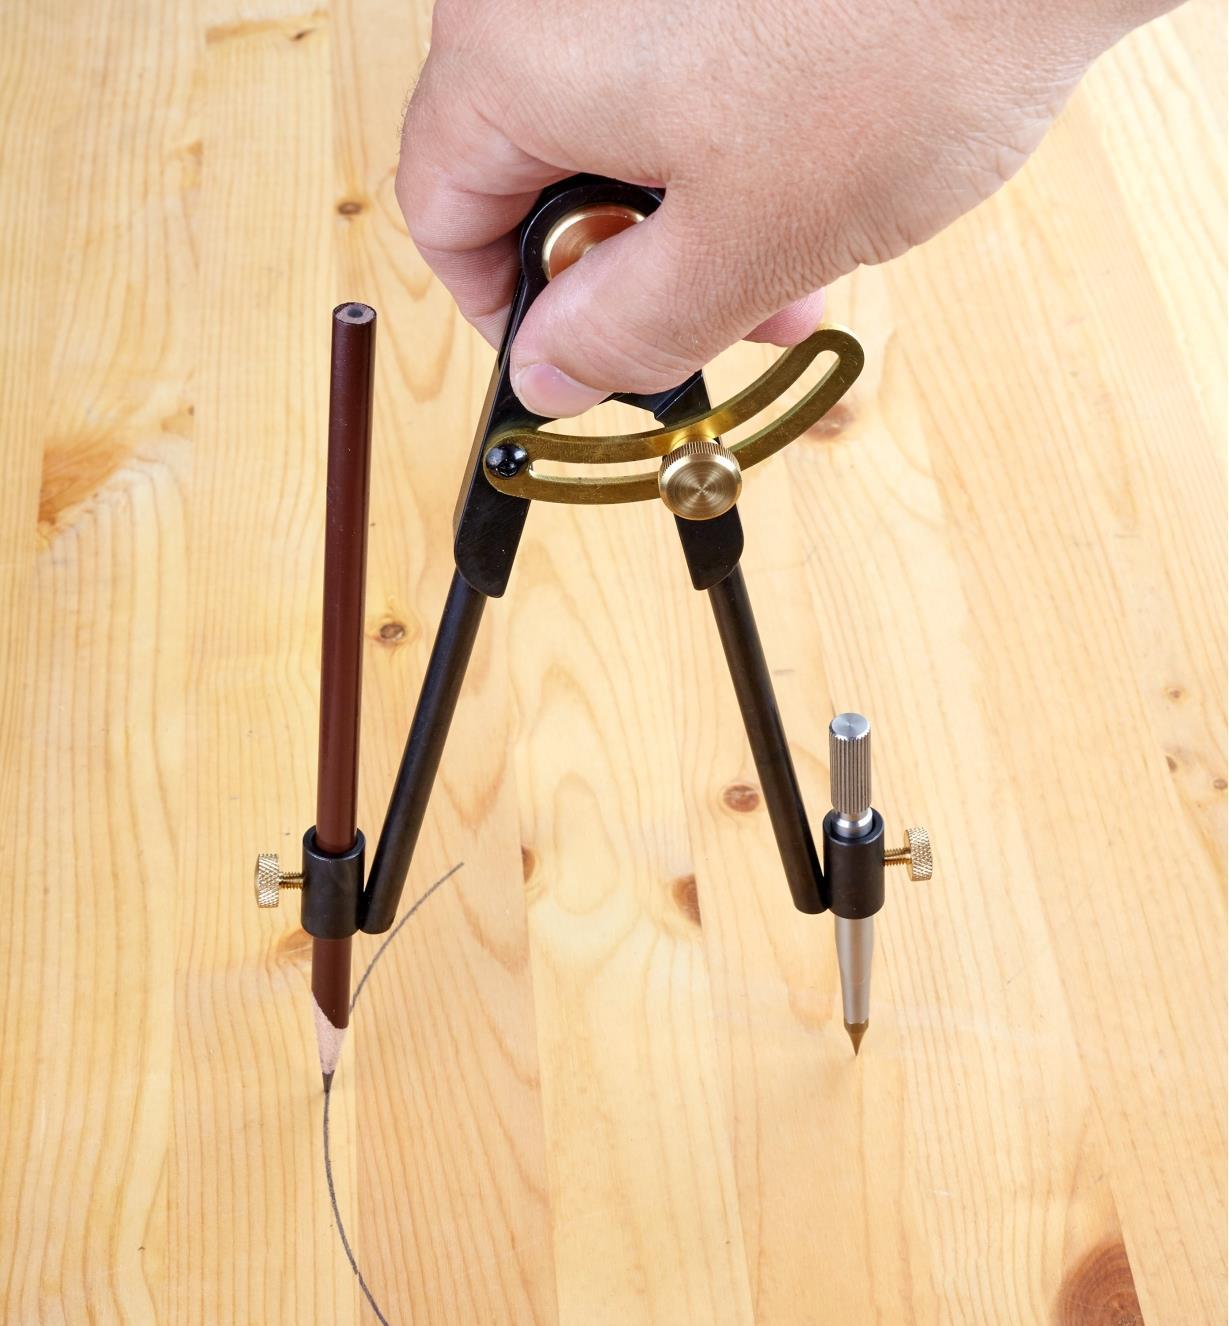 Scribing a circle onto a wooden surface using a bench compass